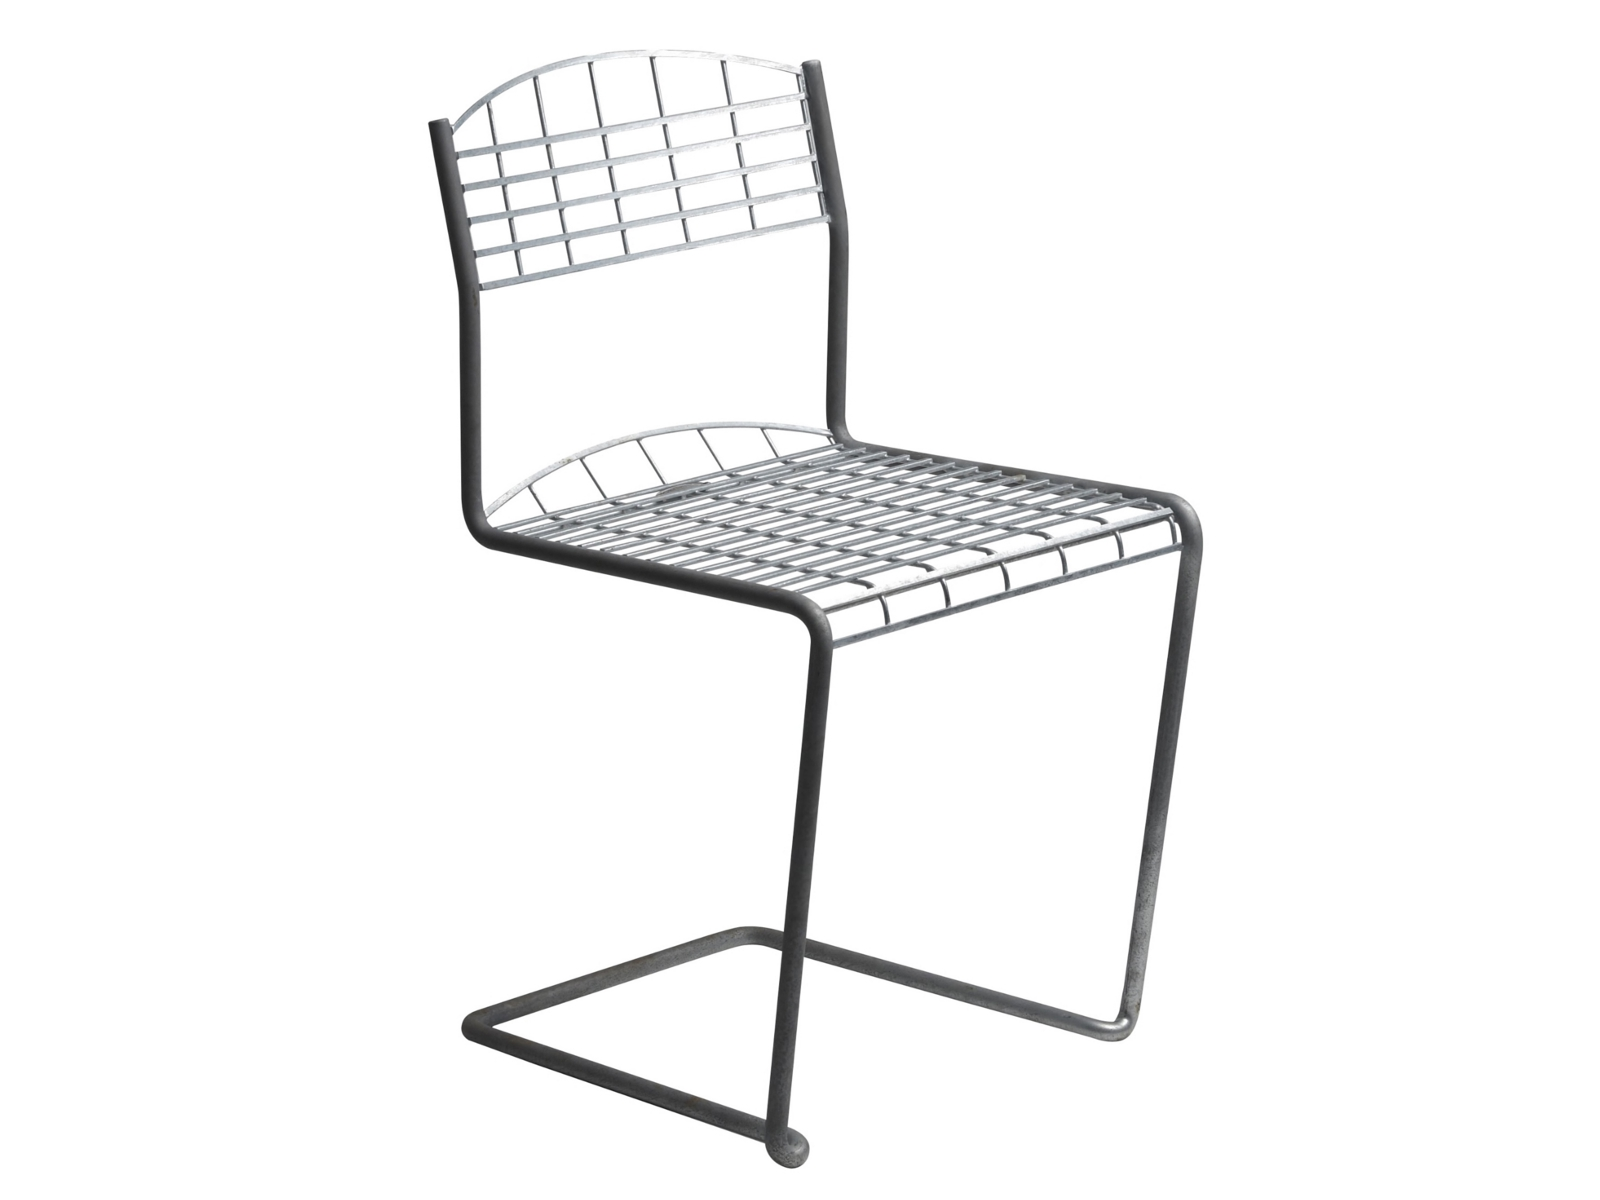 High tech chaise de jardin by grythyttan st lm bler design for Porte metallique jardin